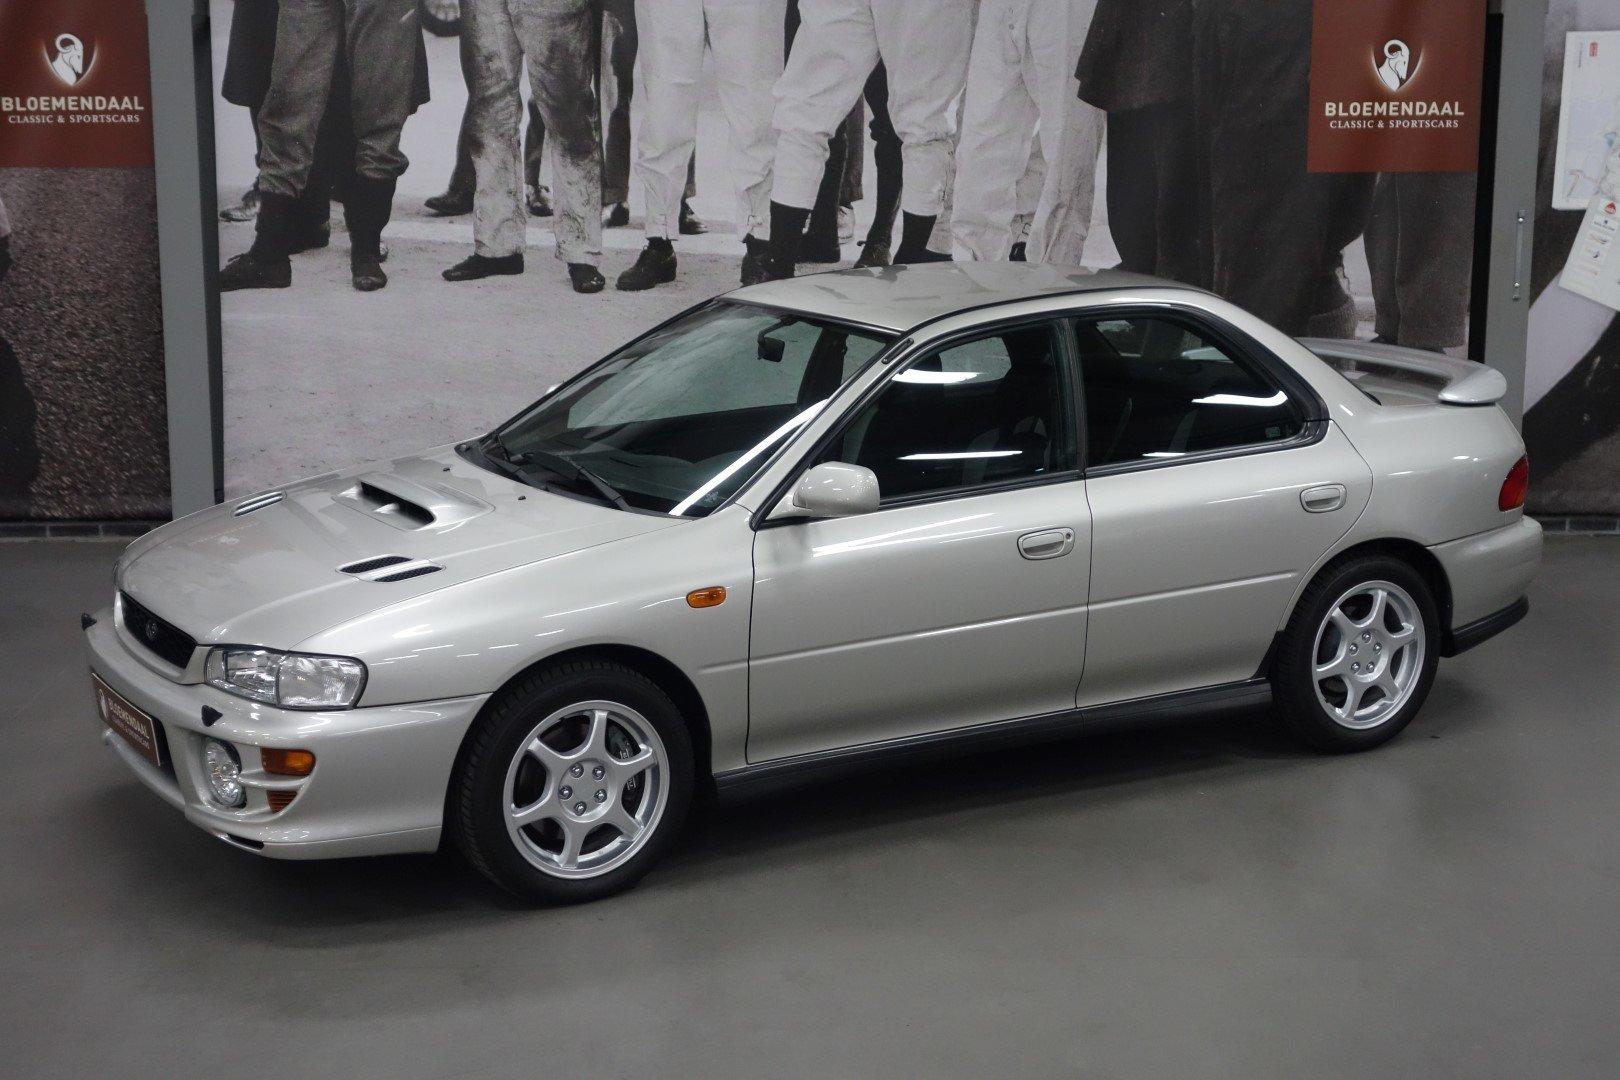 2001 Subaru Impreza 2.0 GT AWD Turbo For Sale (picture 1 of 6)